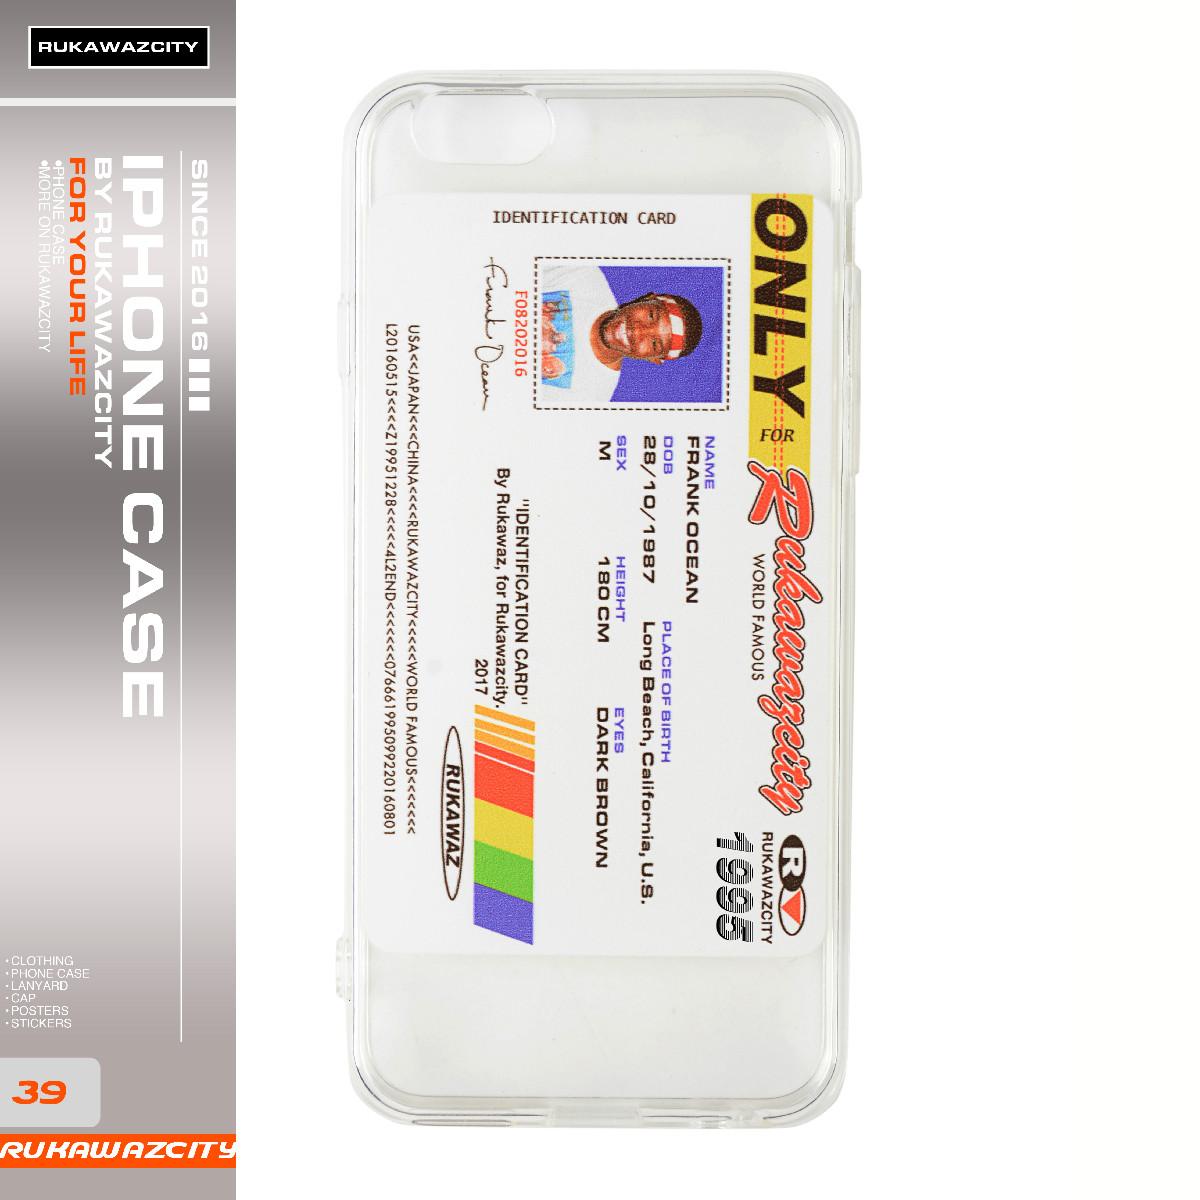 RUKAWAZCITY 原创设计Frank Ocean 法海恶搞证件照iPhone手机壳